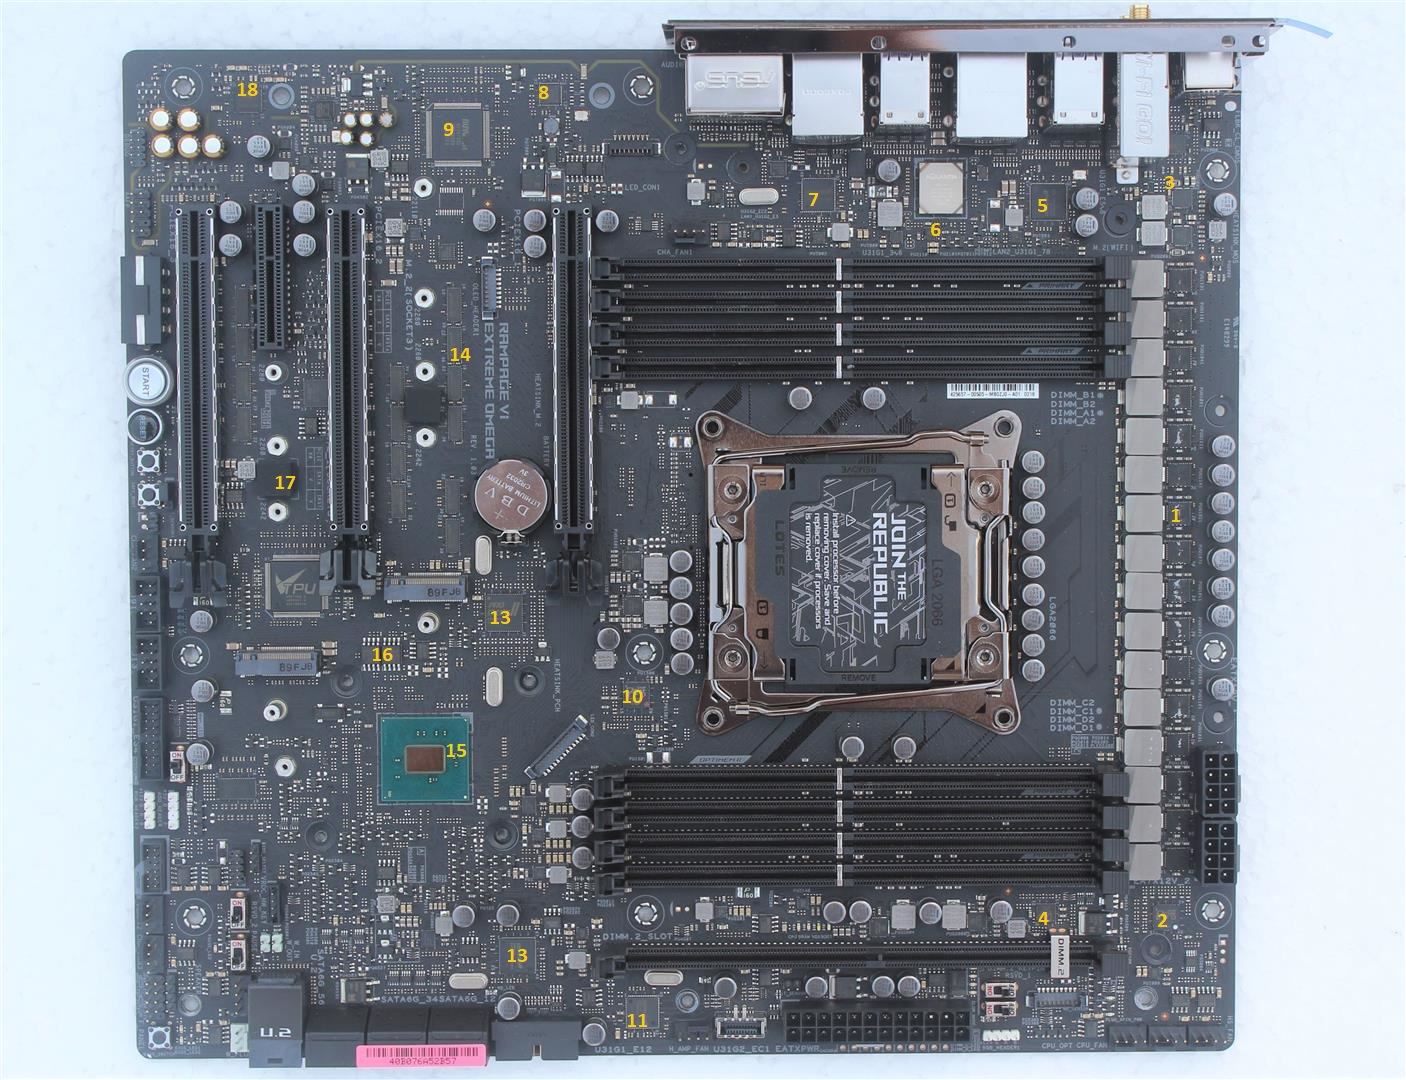 ASUS ROG RAMPAGE VI EXTREME OMEGA Motherboard Review - PC TeK REVIEWS